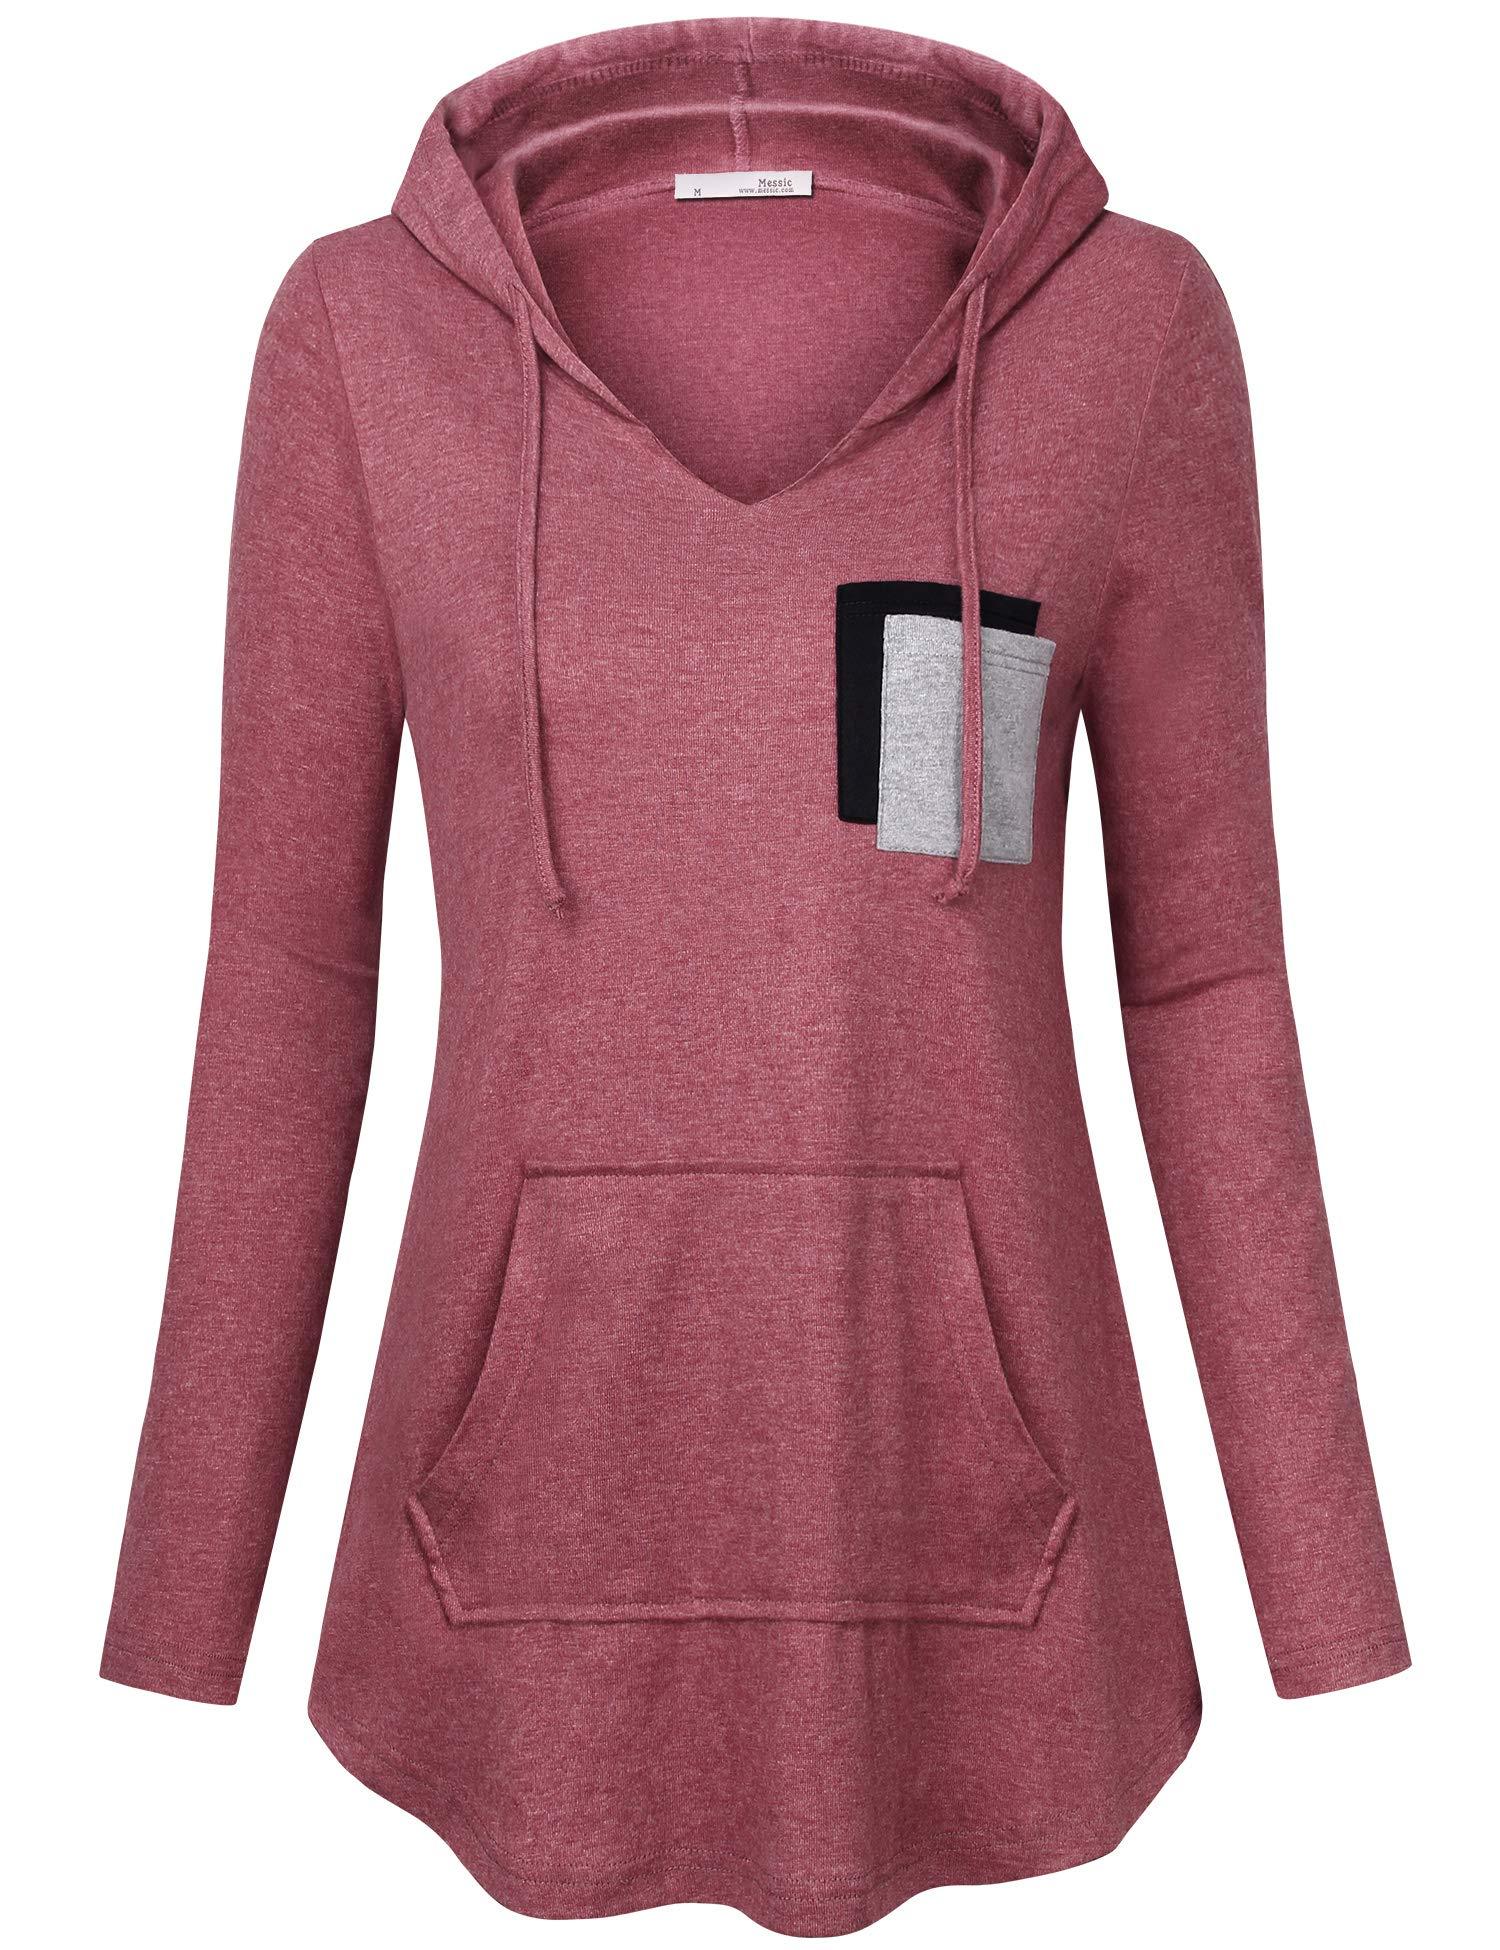 Messic Women Hoodies & Sweatshirts, Womens Casual Pullover Sweaters V-Neck Hoodie Long Sleeve Kangaroo Pocket Tunic Sweatshirt Loose Fit Tunic Tops Wine Red Medium